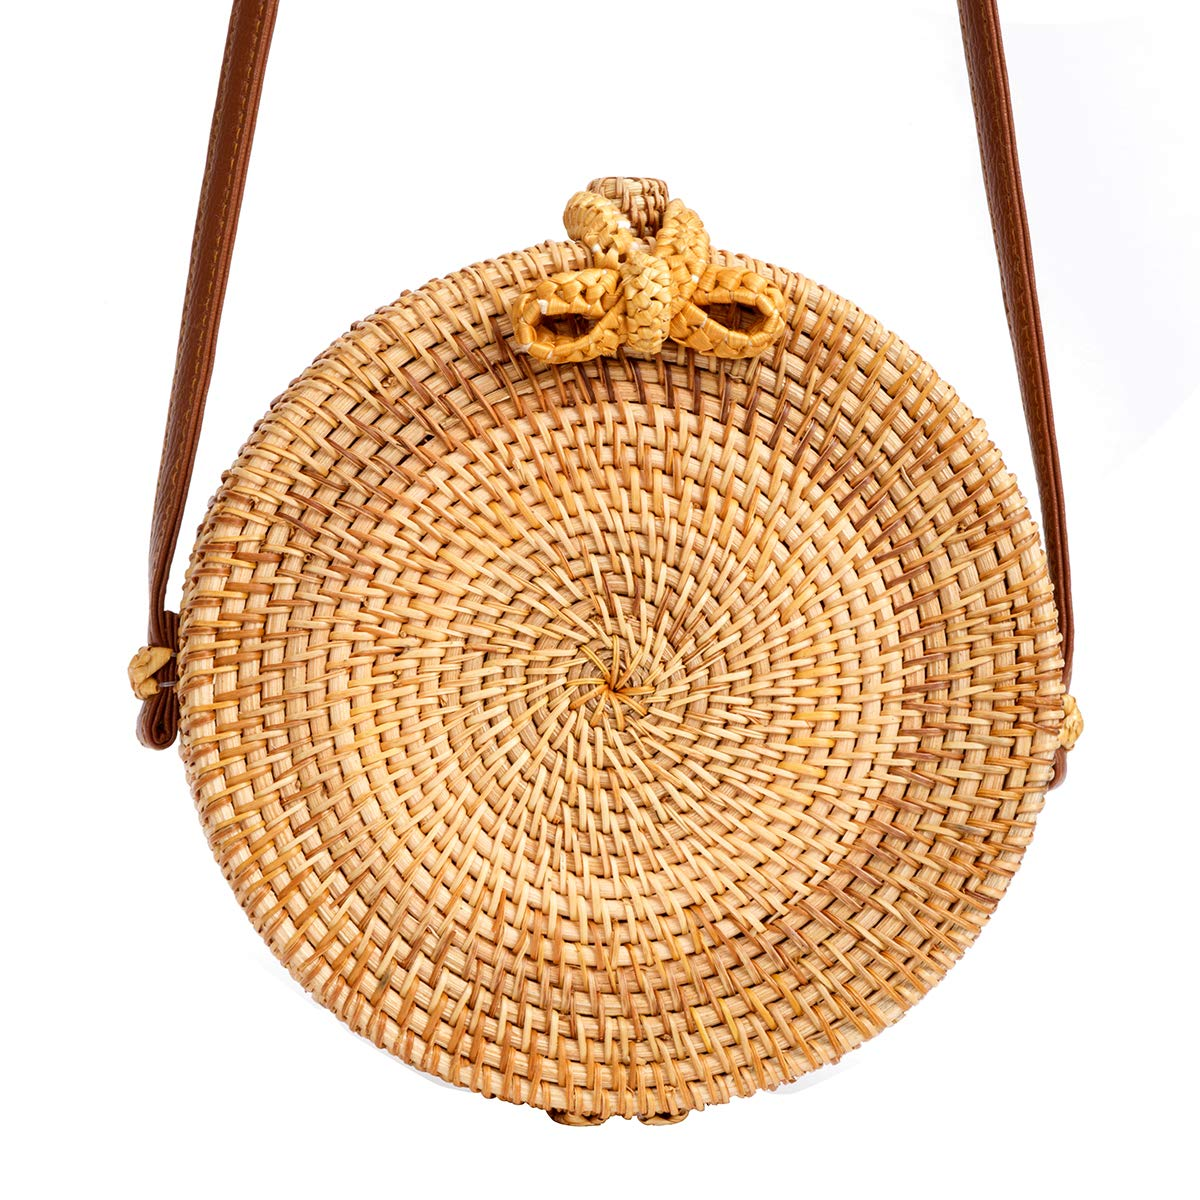 Round Rattan Bag for Women Lefur Handwoven Straw Bag Beach Crossbody Purse with Shoulder Straps Lined Handbag